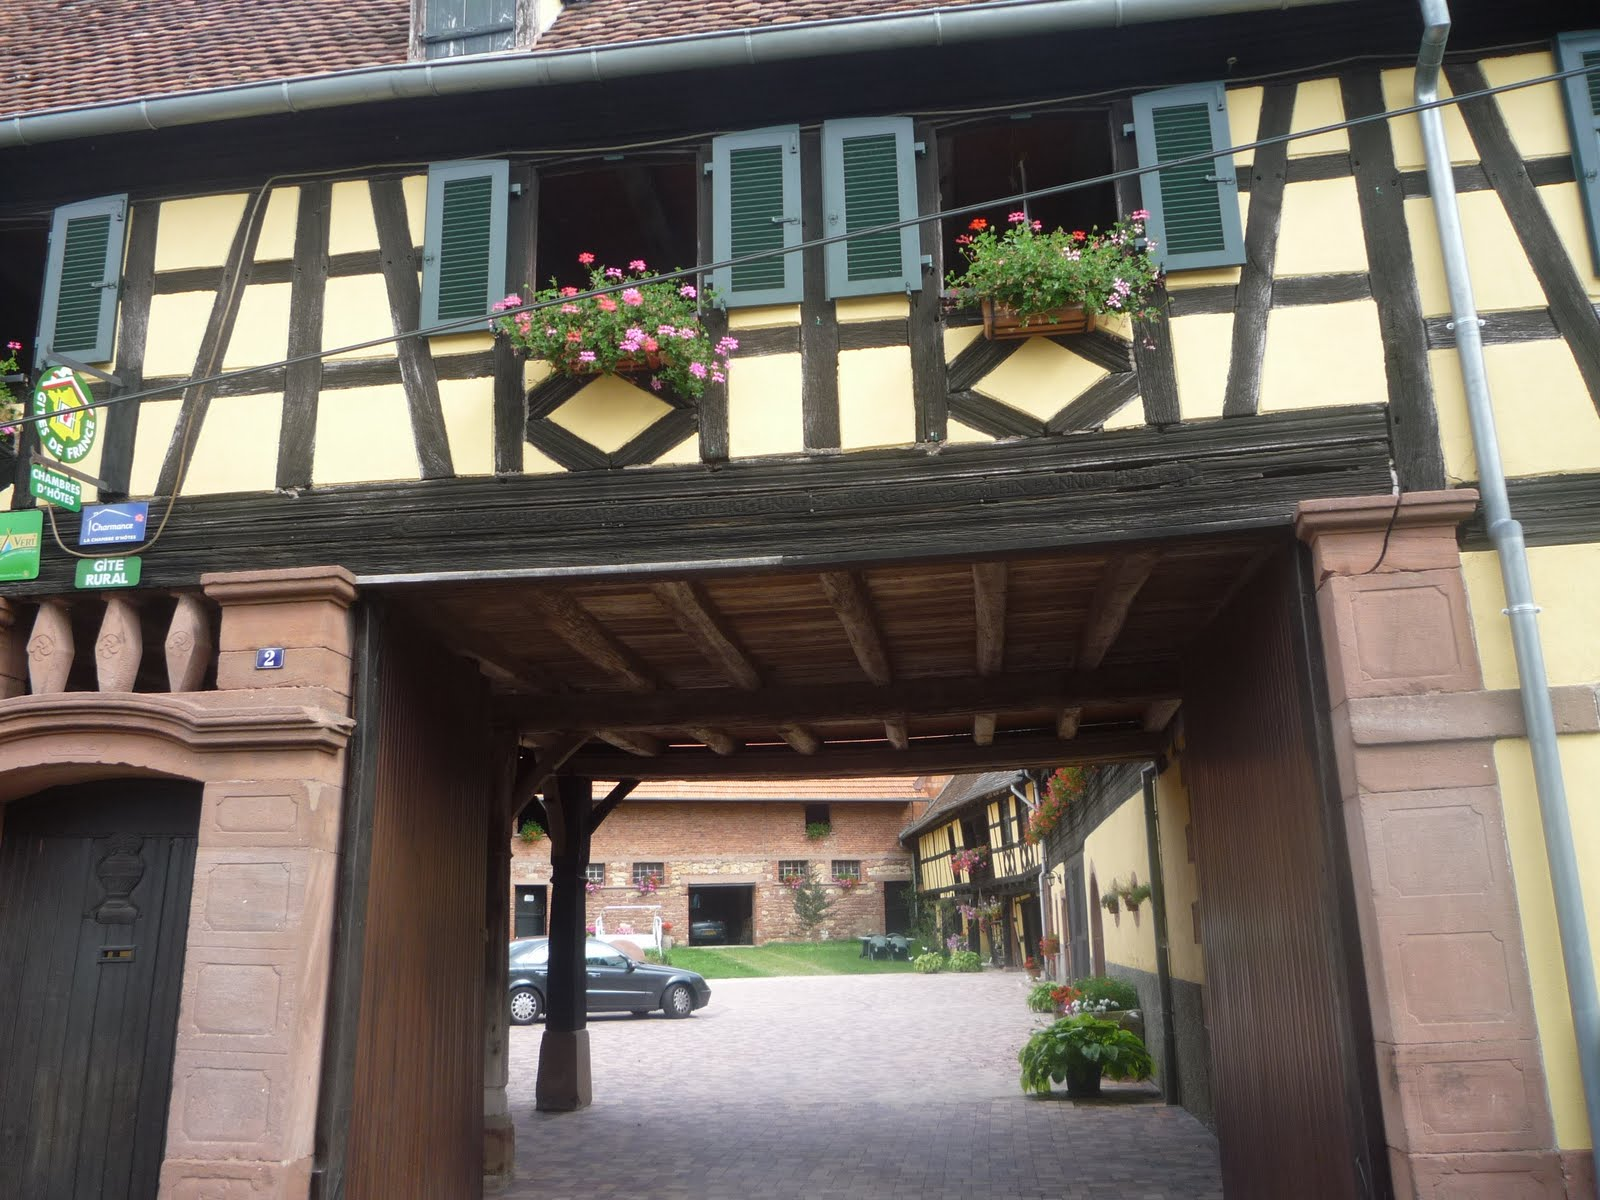 Famille issenhaussen et obersteinbach for Taille portillon